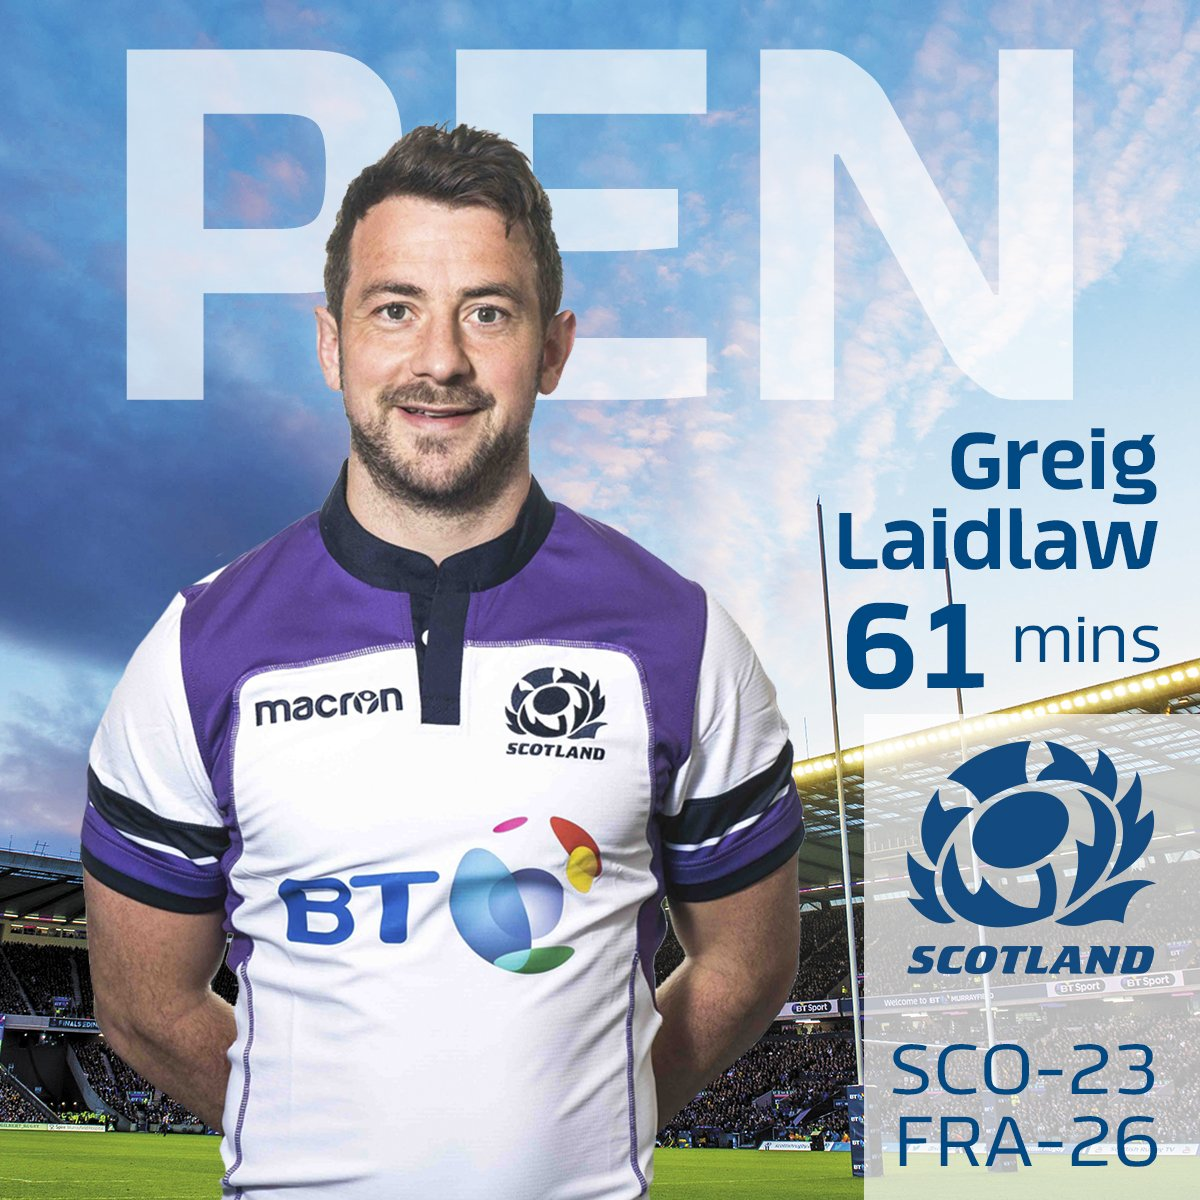 Scotlandteam